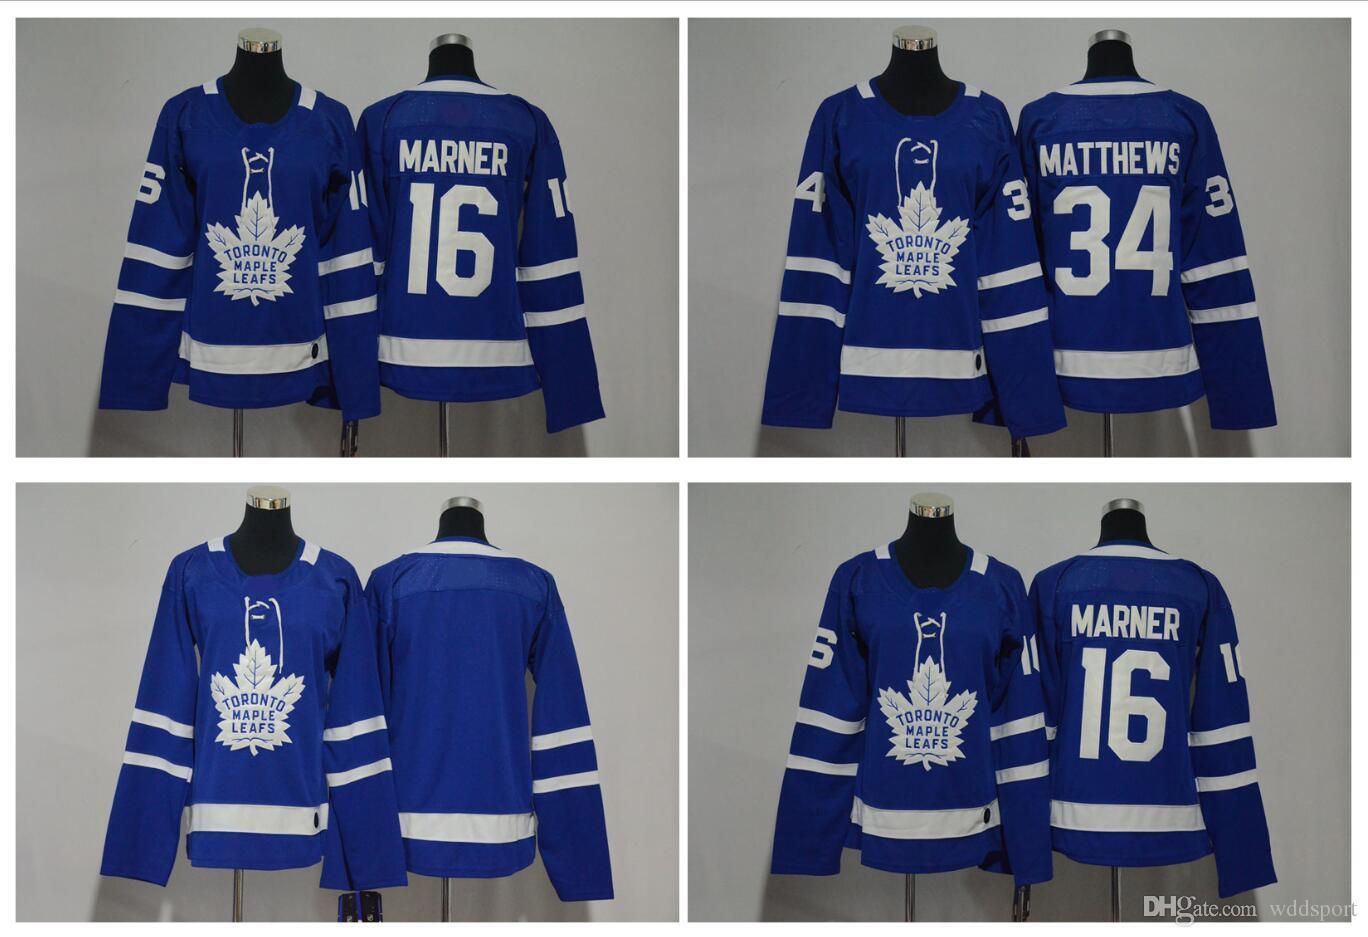 promo code c588d 69b8d 2018 AD Women Toronto Maple Leafs Jersey 34 Auston Matthews 16 Mitch Marner  Blank Blue Stitched Ladies Hockey Jerseys